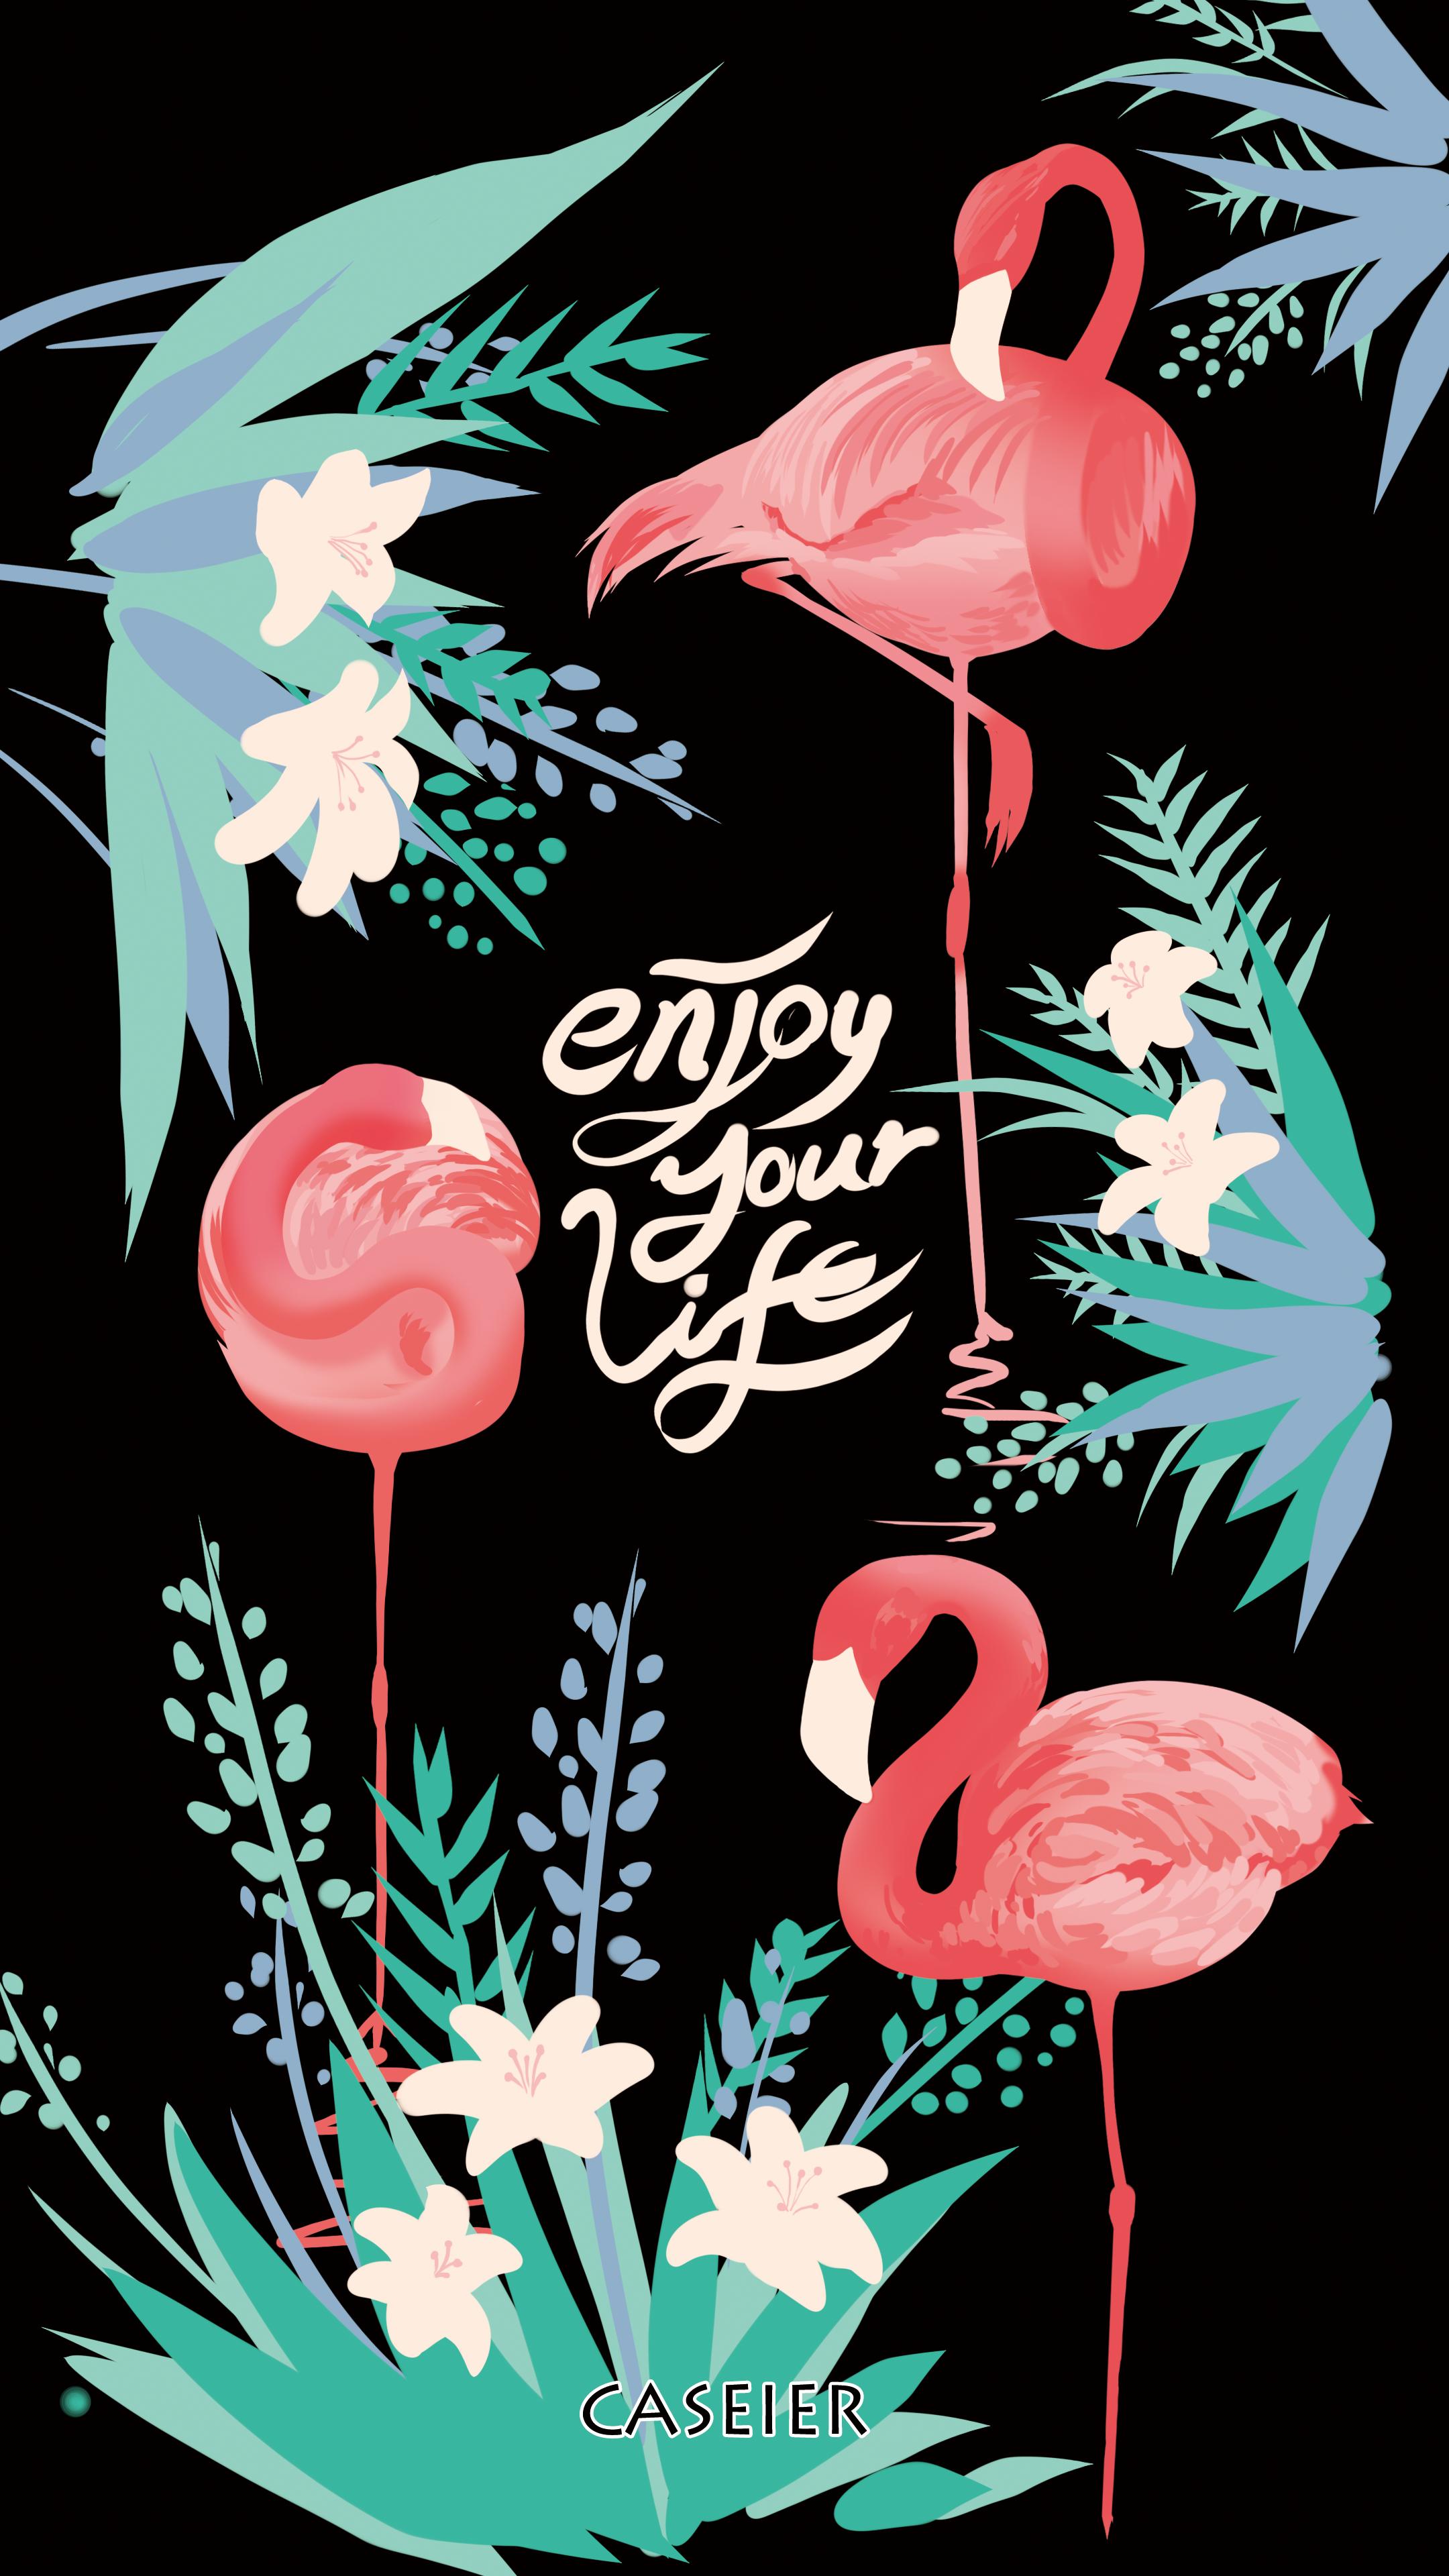 Cool Flamingo Seni Flamingo Latar Belakang